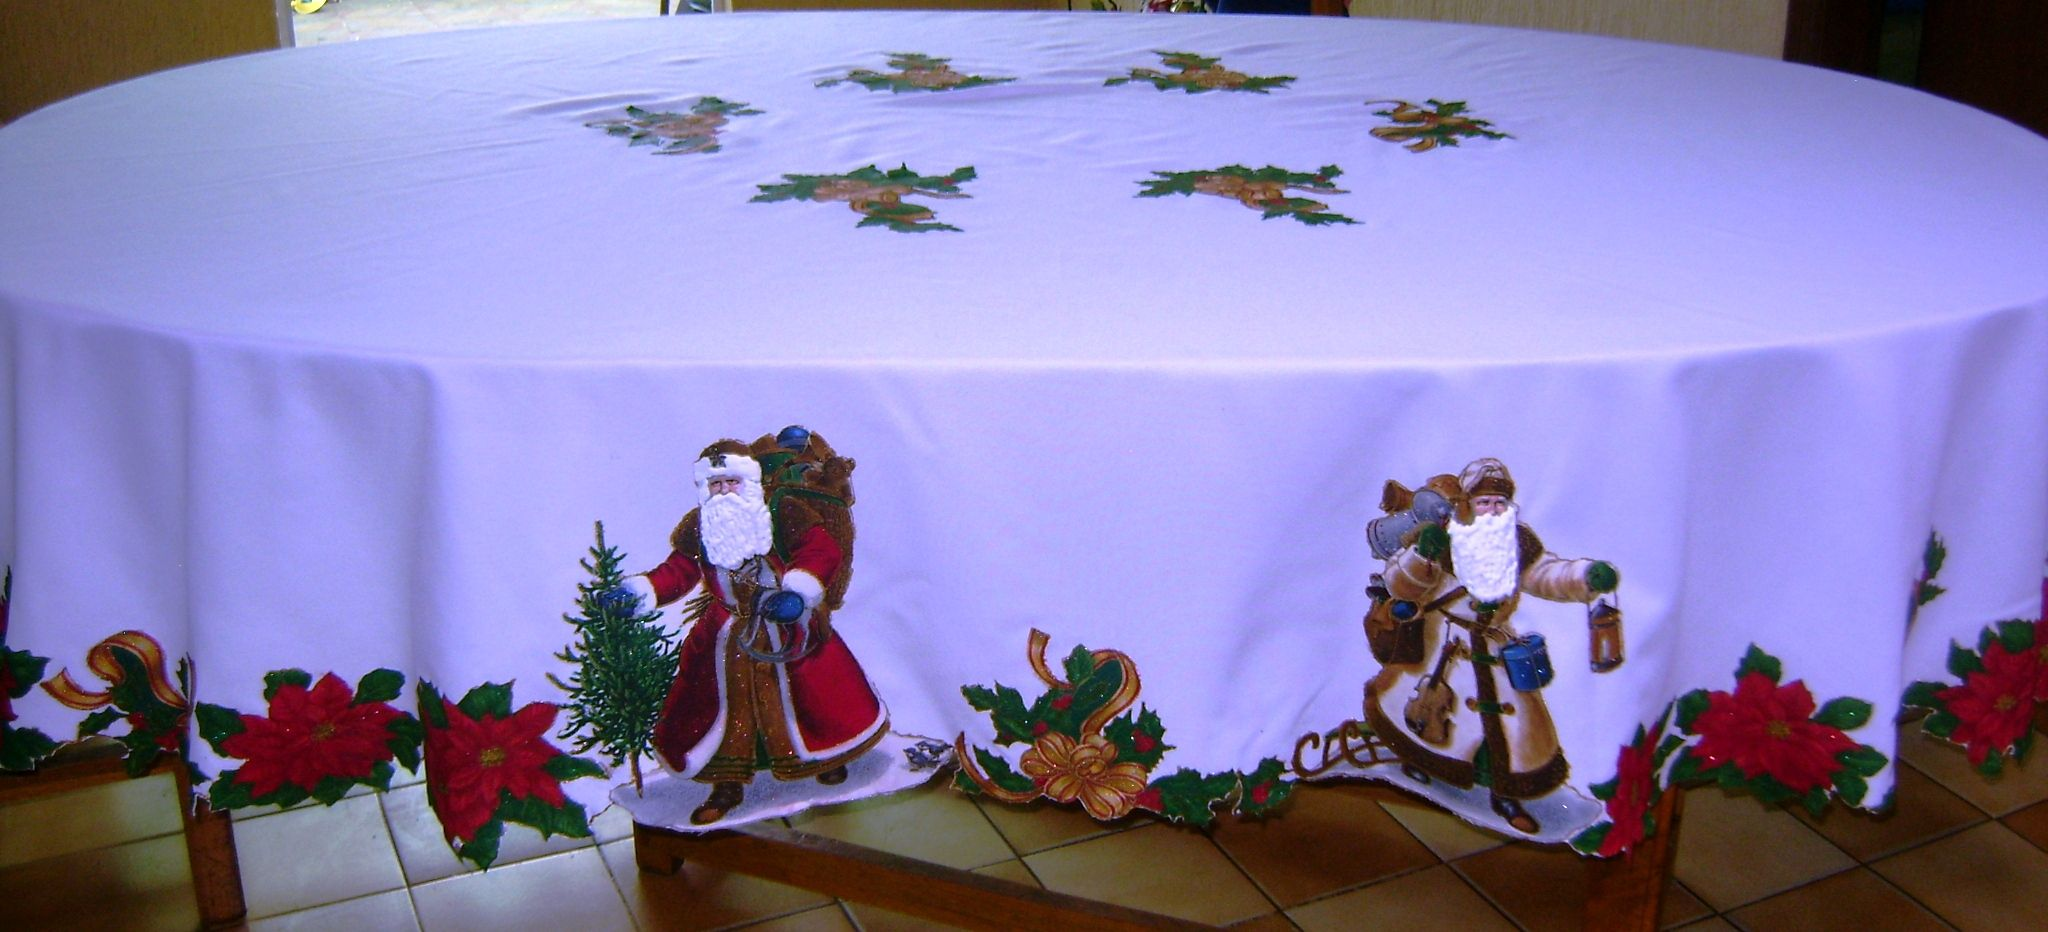 Manualidades Manteles Para Navidad.Mantel Navideno Con Aplicaciones Manteles Navidenos